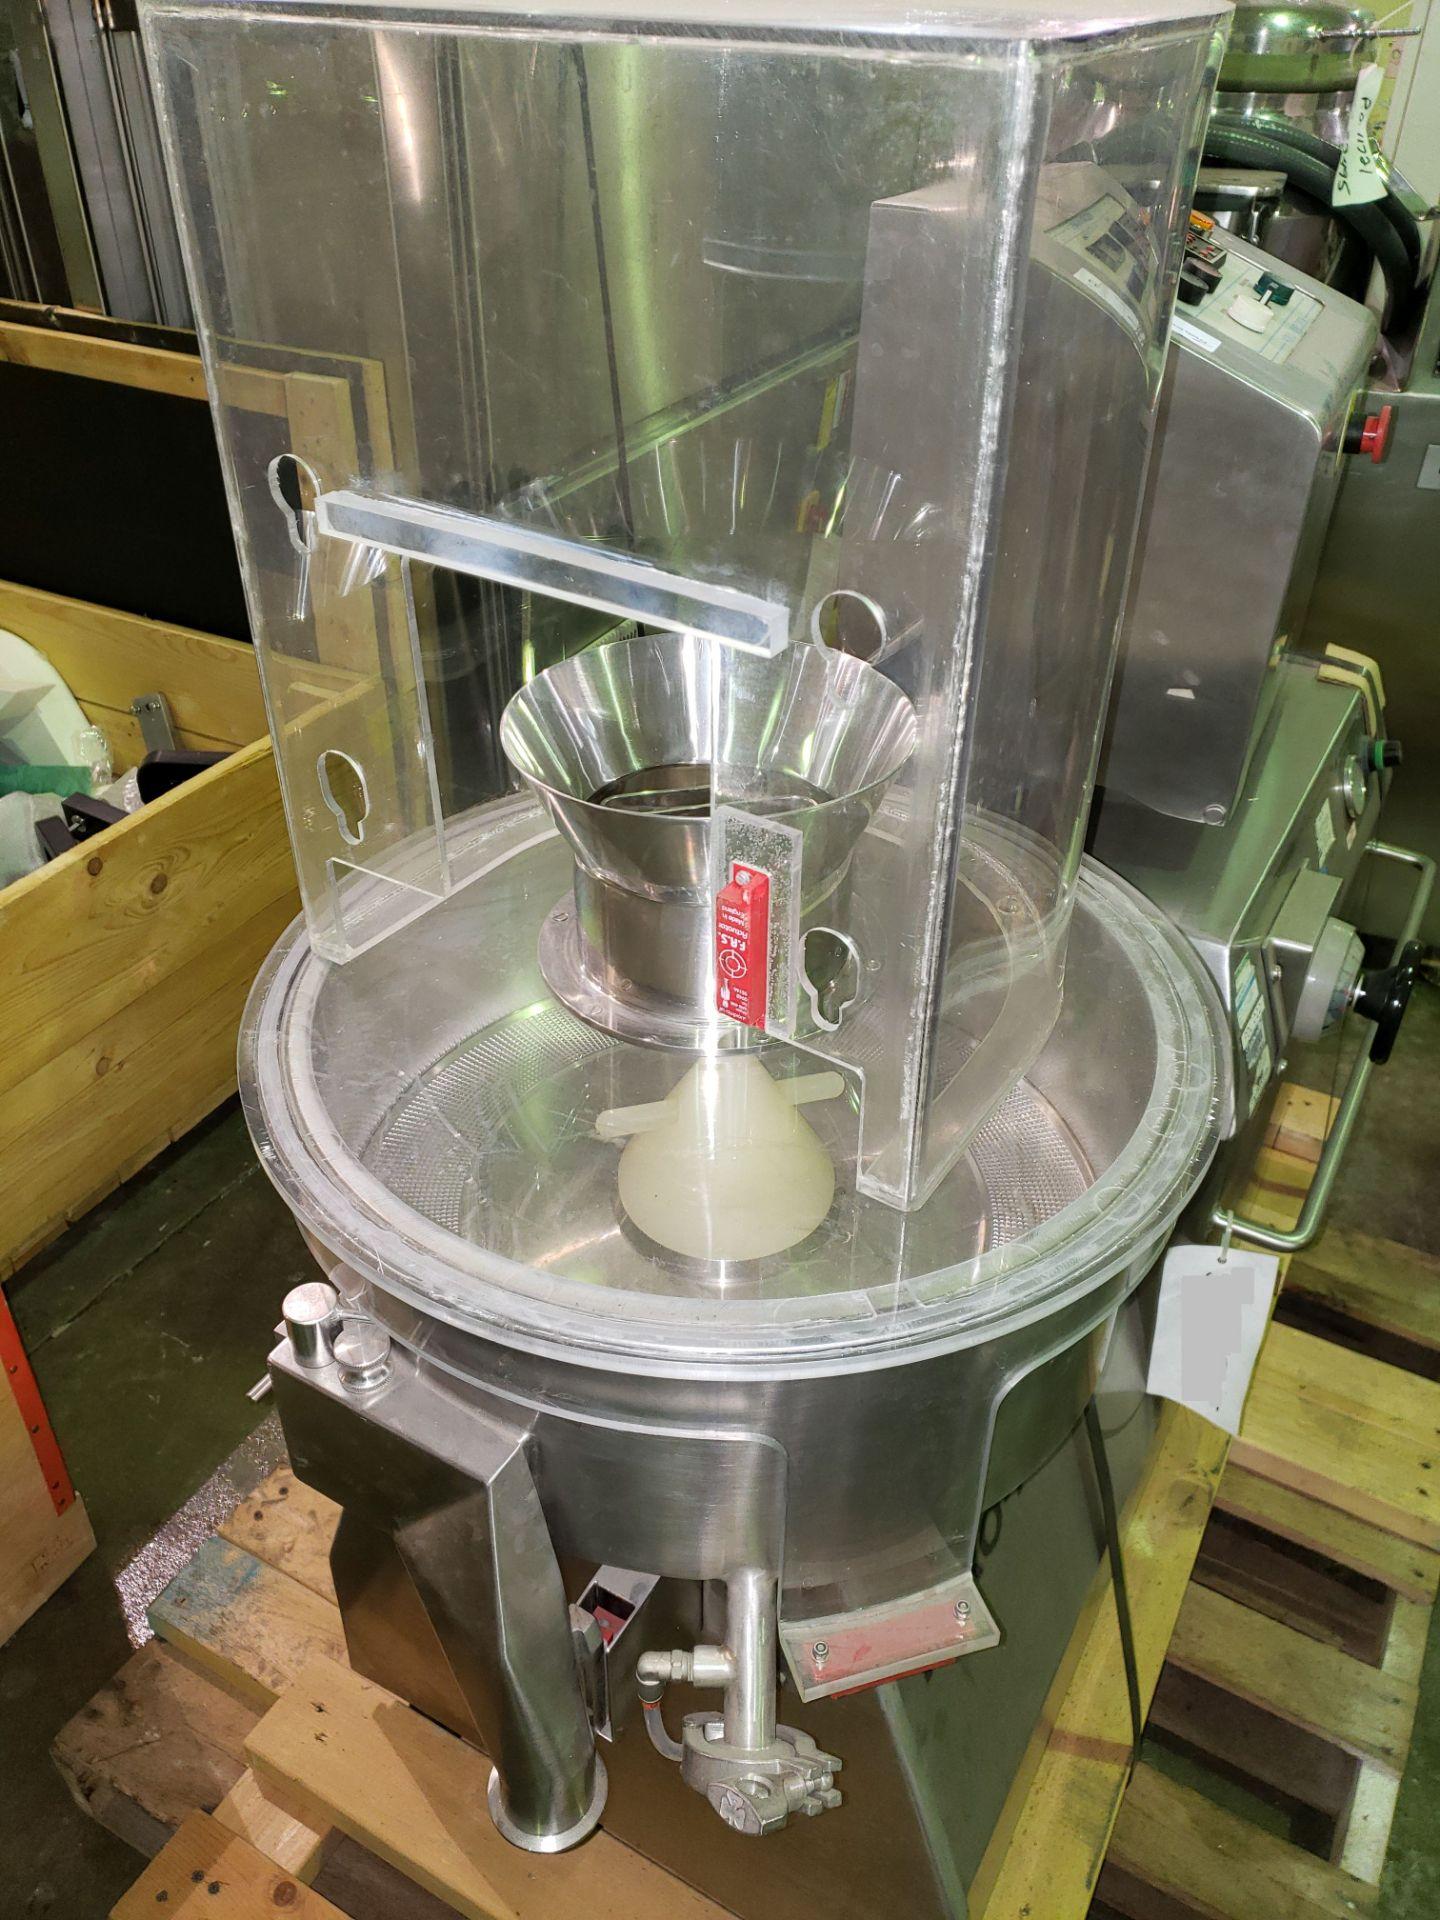 Lot 33 - Niro Fielder NICA spheronizer, model S-450, stainless steel construction, 450mm diameter